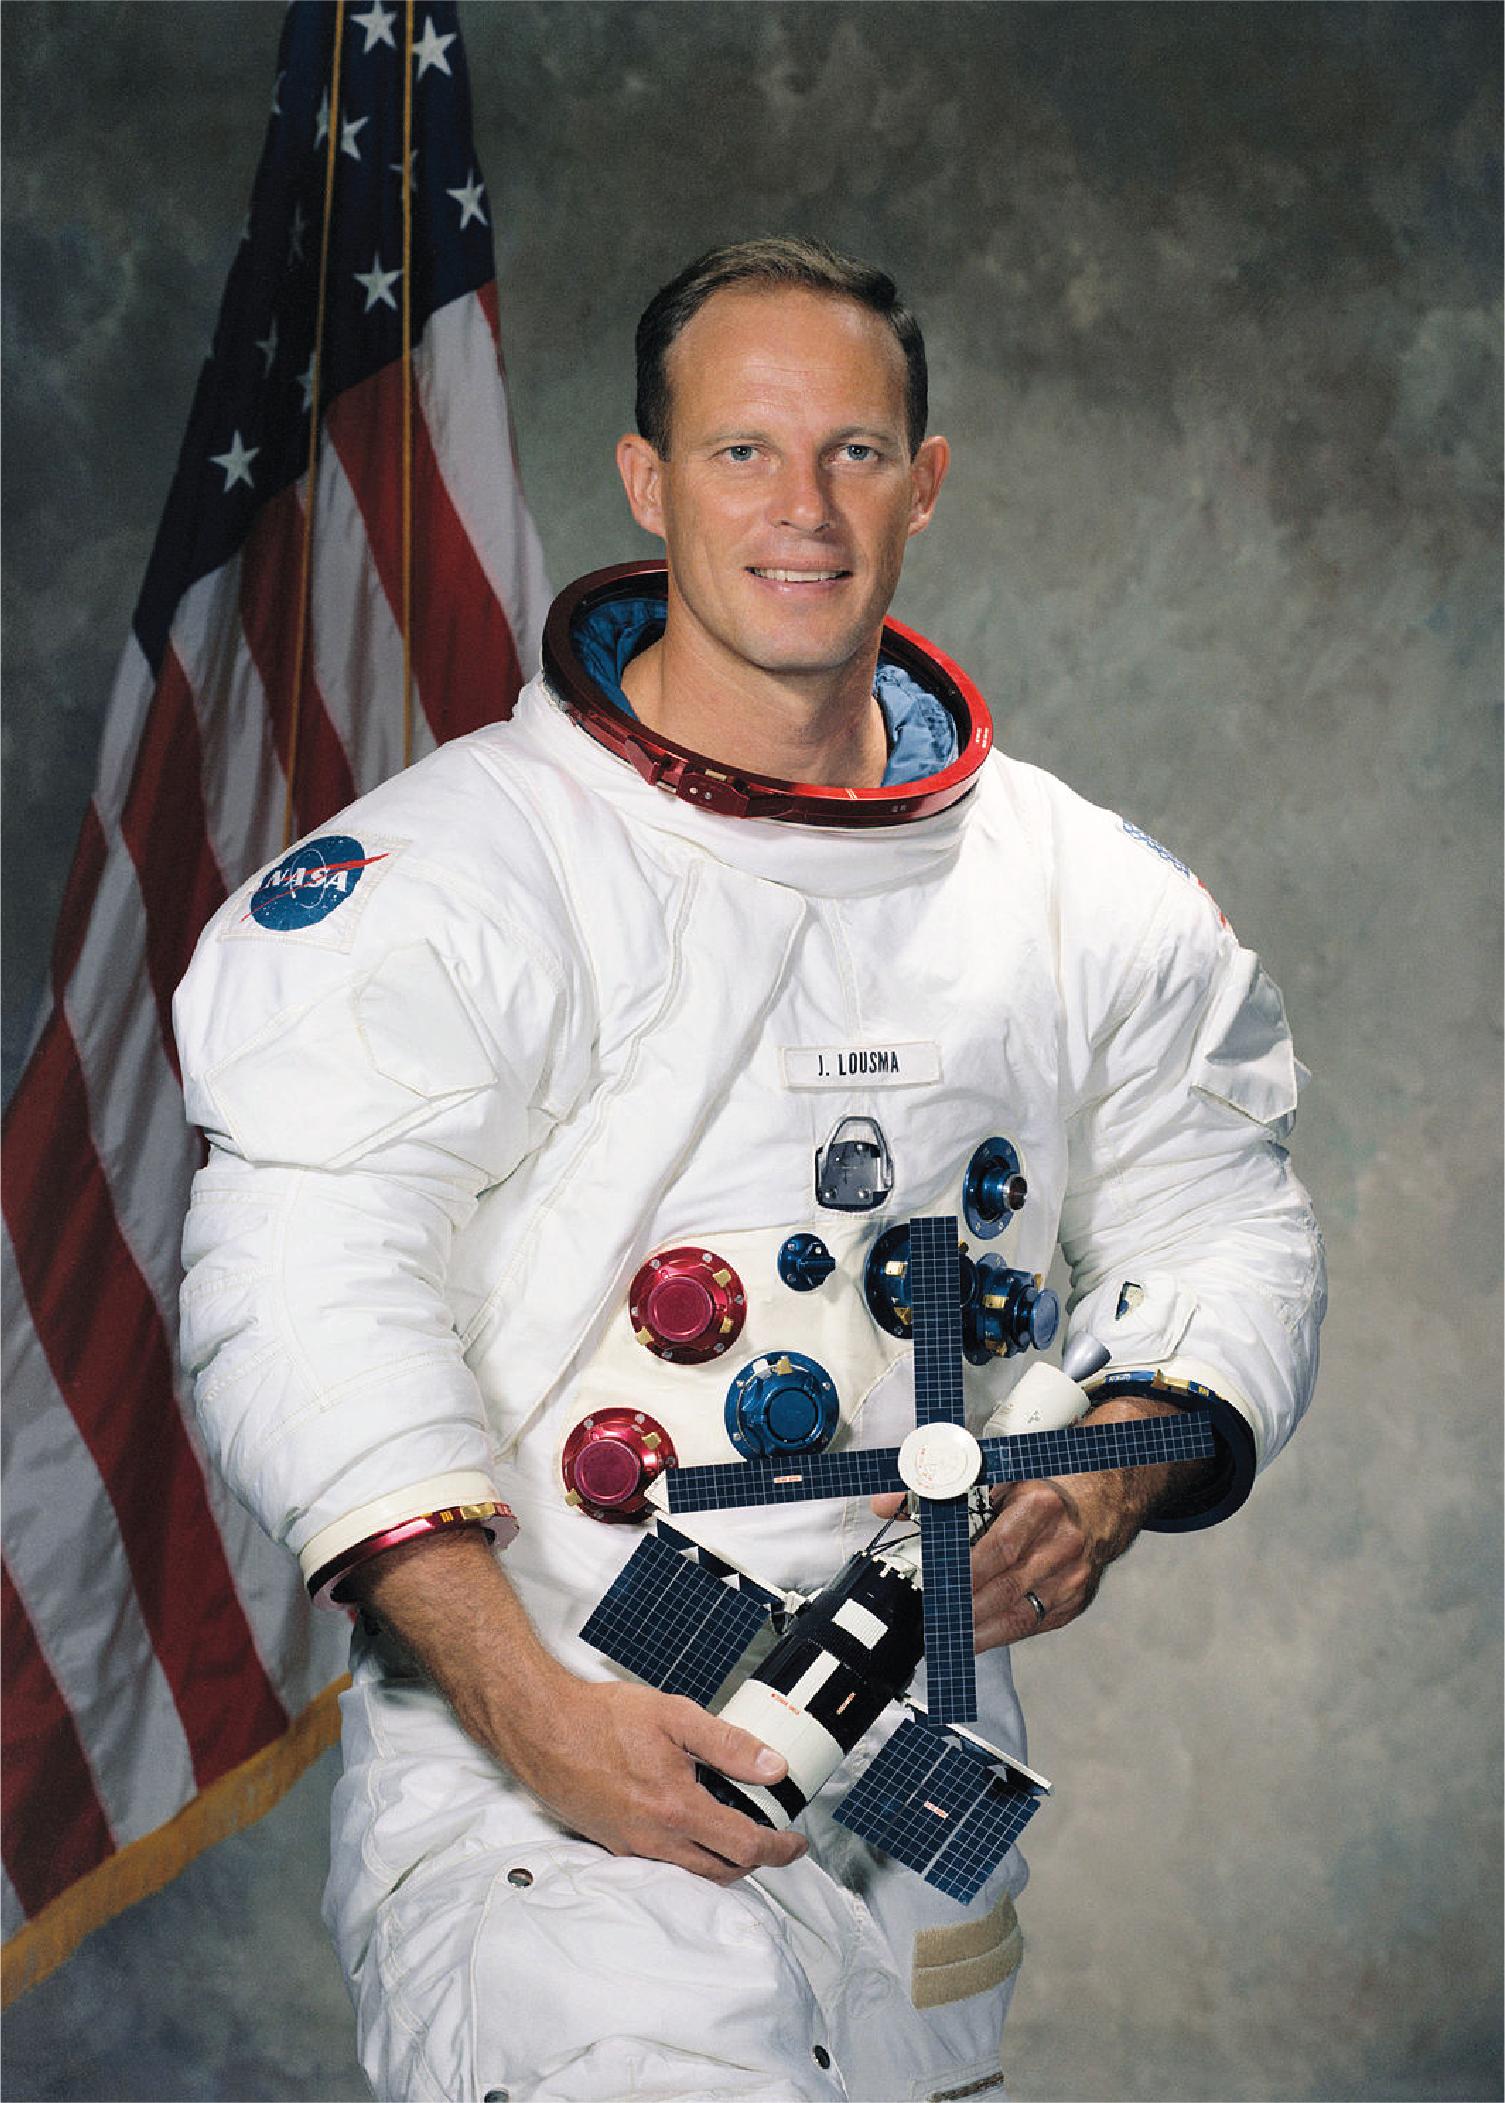 Astronaut Jack Robert Lousma (Colonel, USMC, RET.)